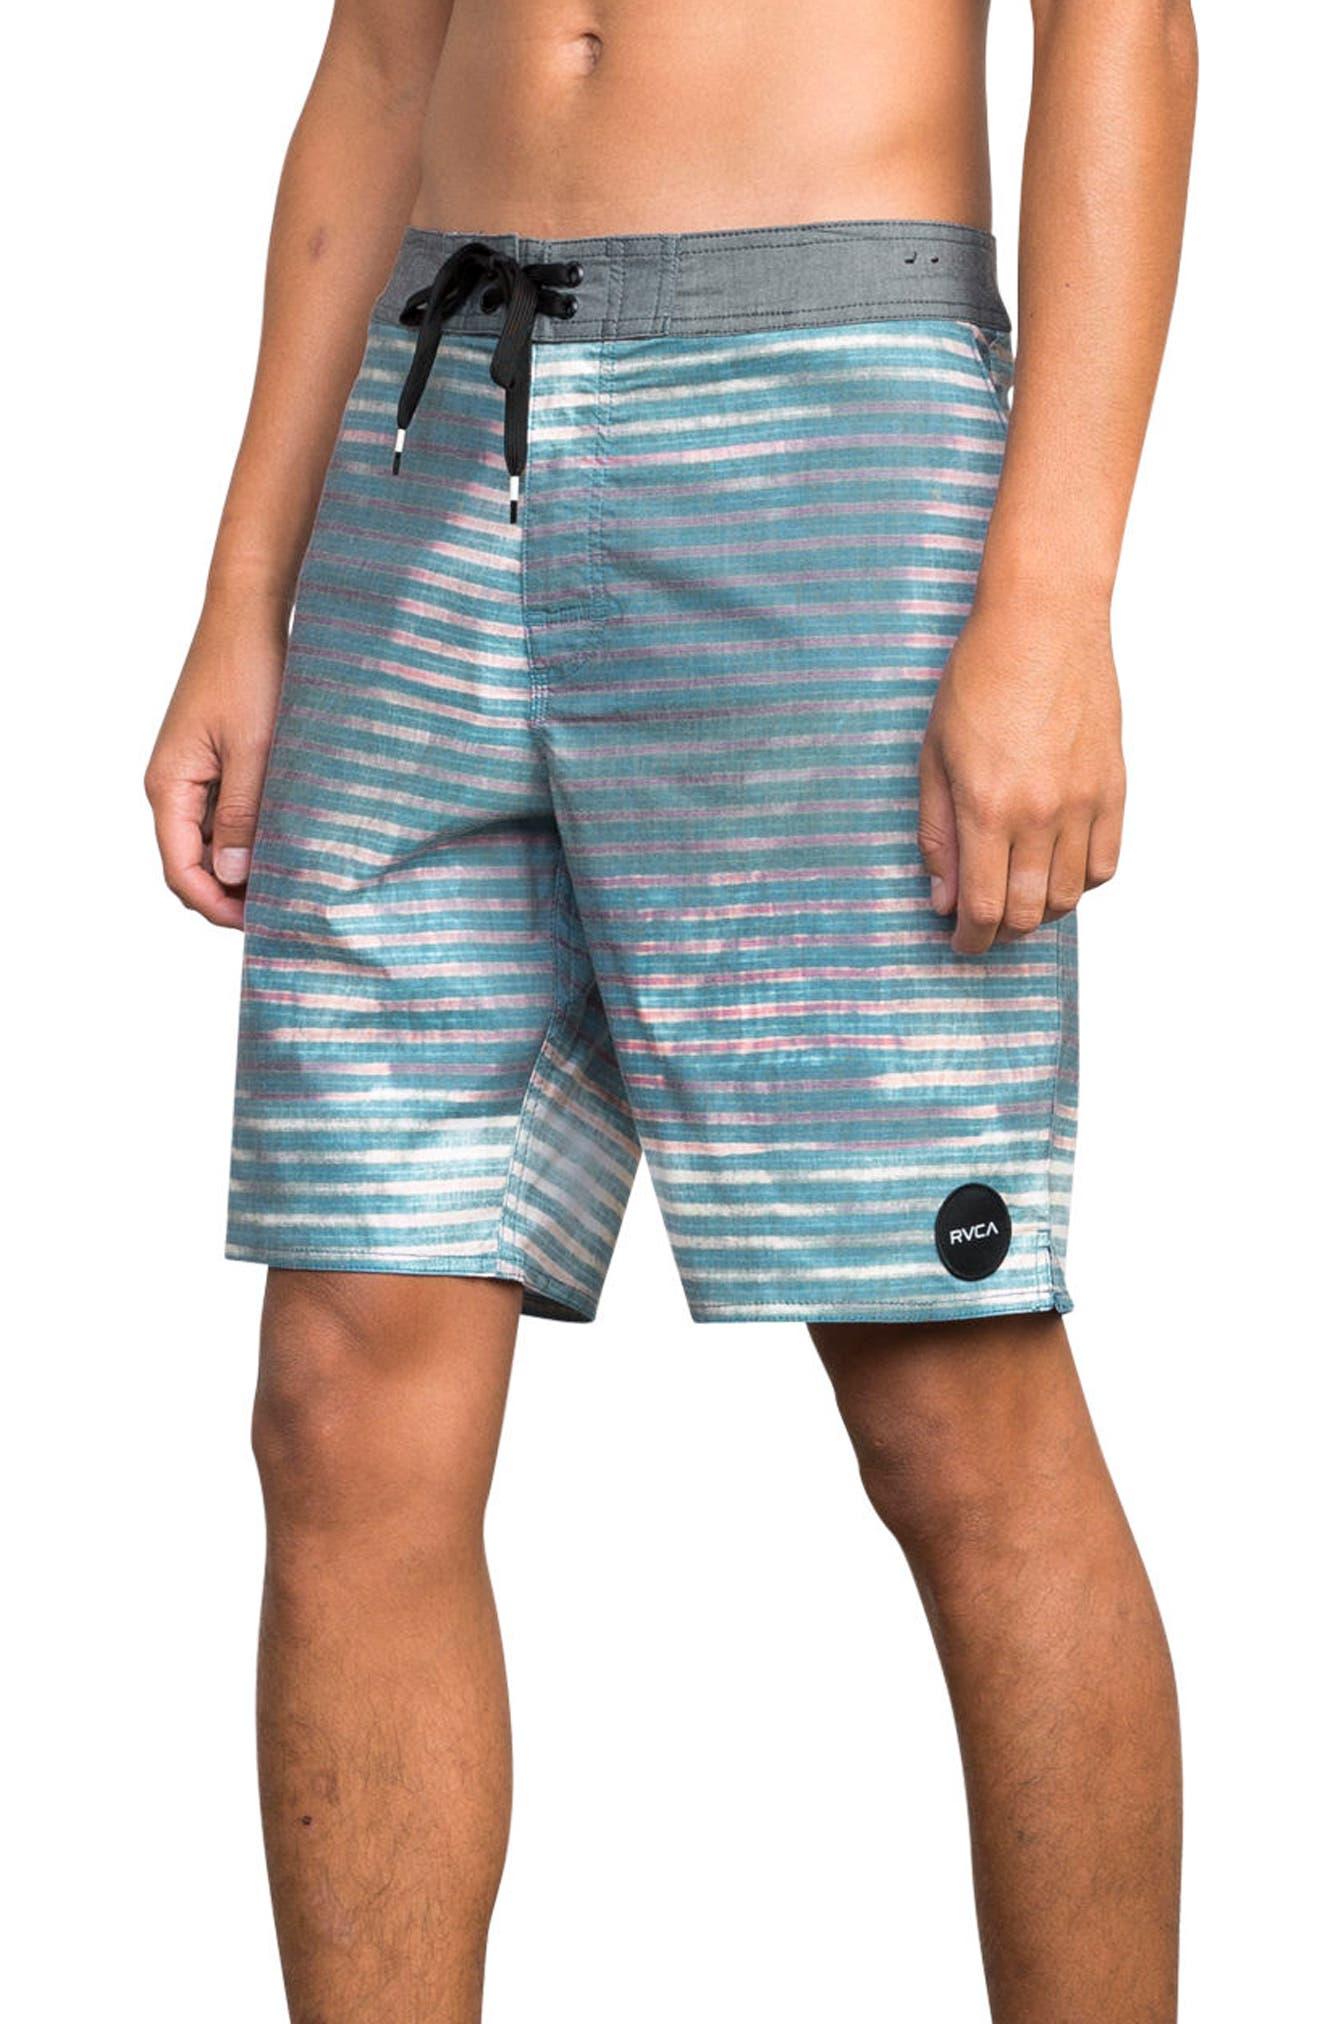 Boppa Stripe Swim Trunks,                             Alternate thumbnail 7, color,                             402